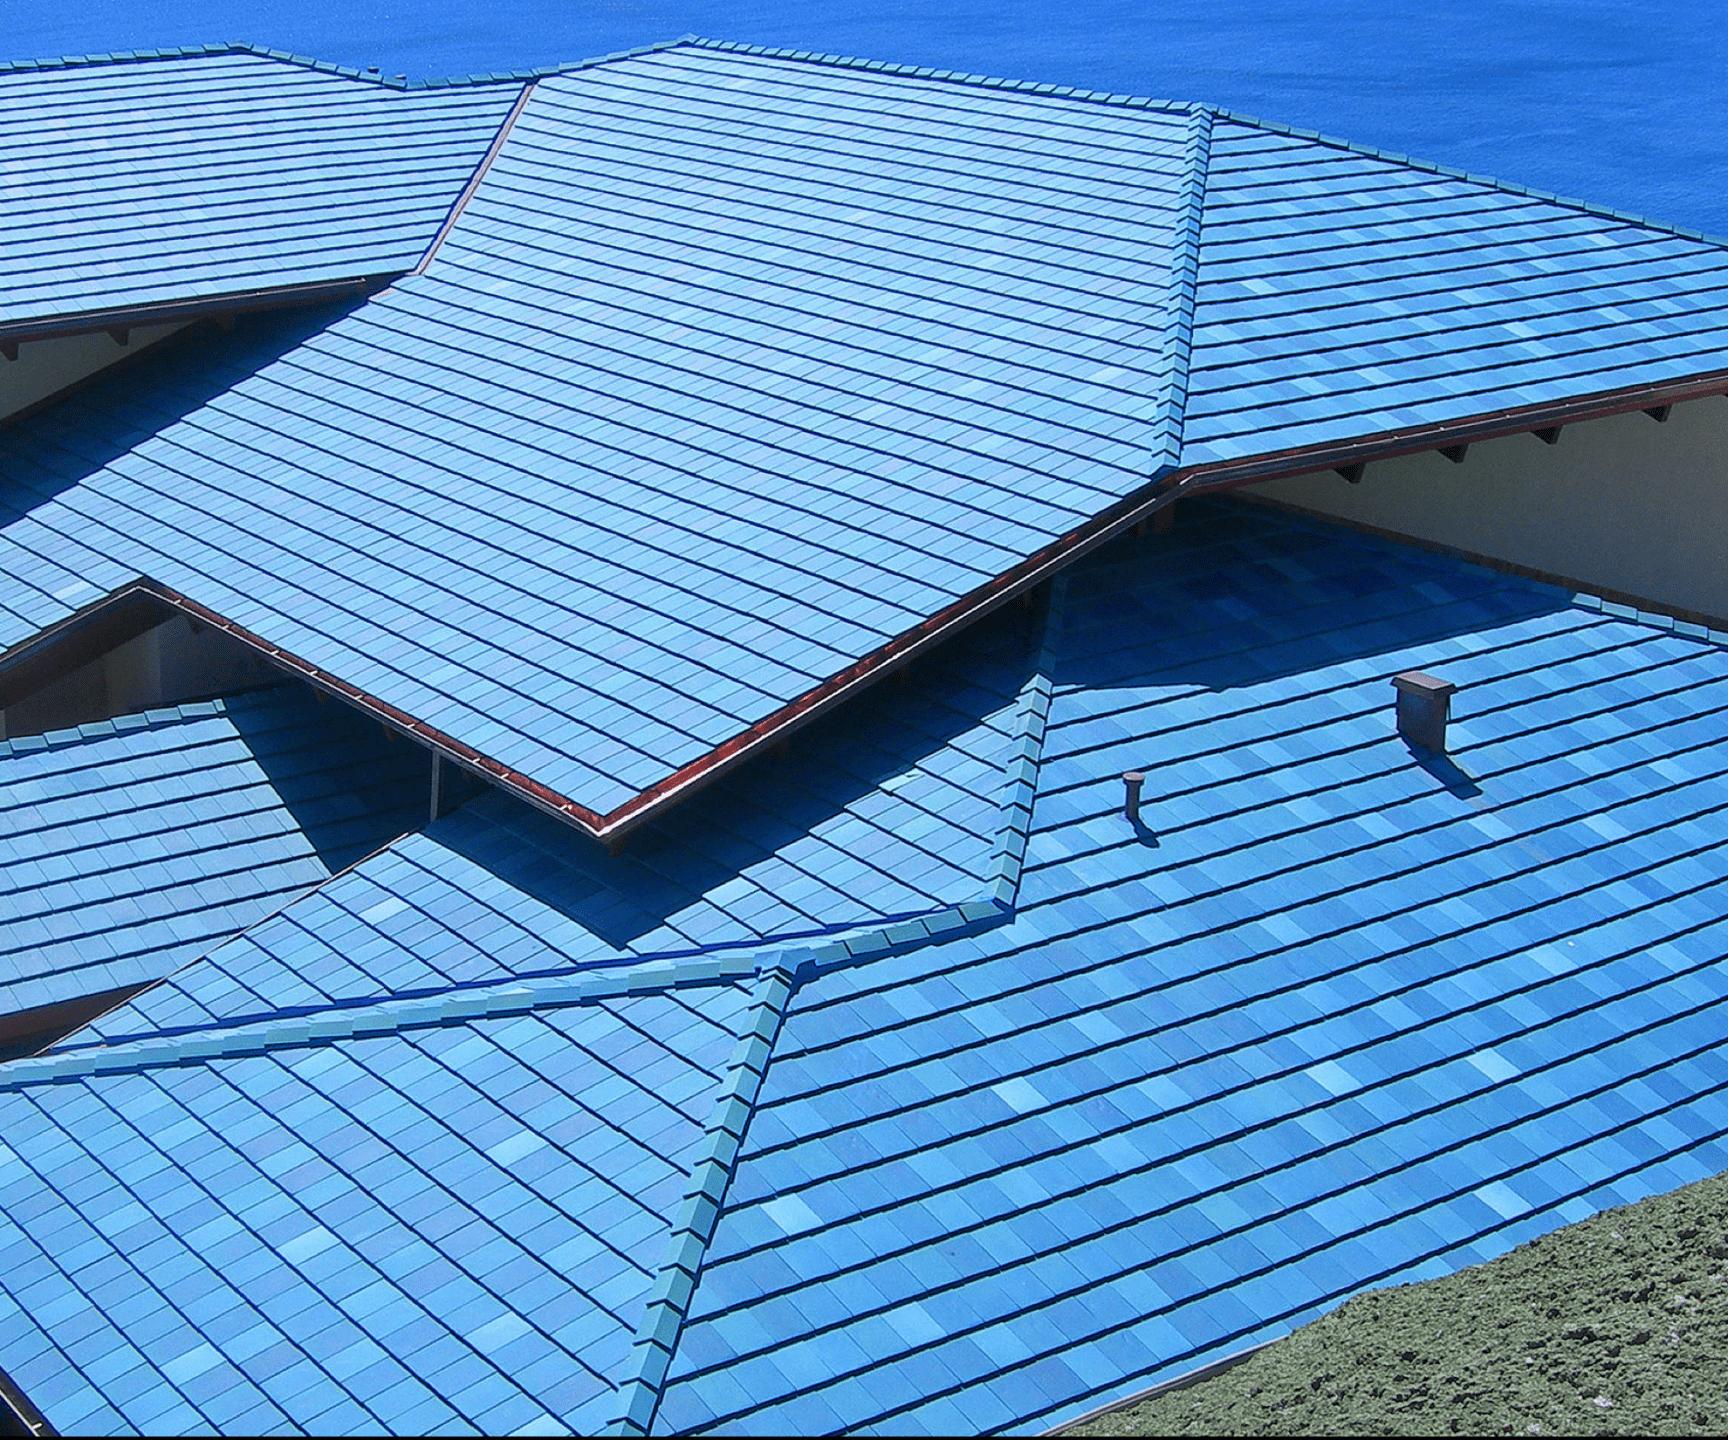 Roof Tile Terracotta Roof Tile Ludowici Roof Tile